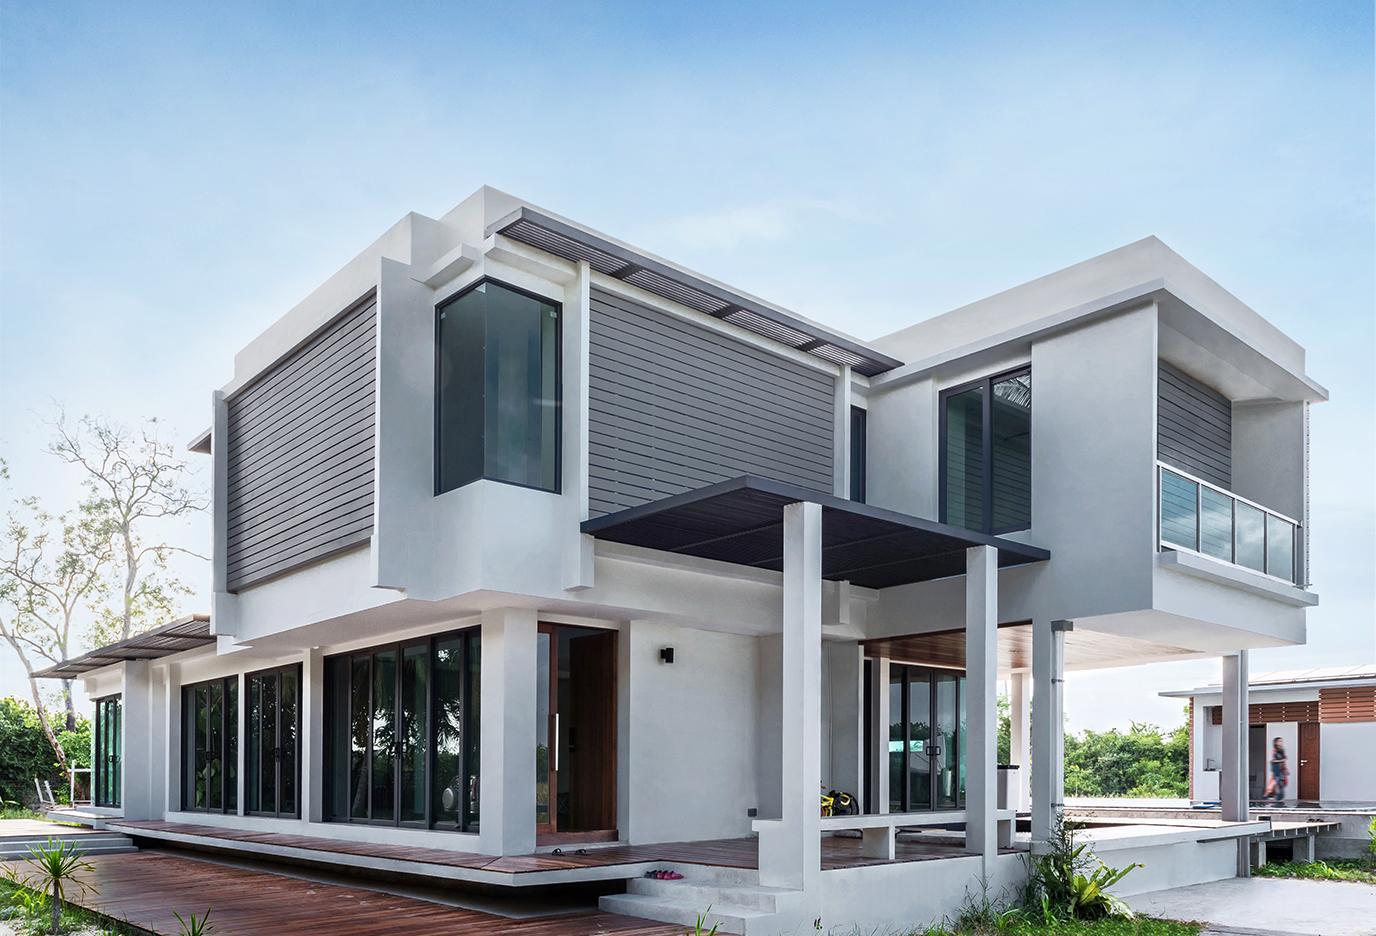 10design uthai residence house design modern architecture pattani thailand swimming pool 04